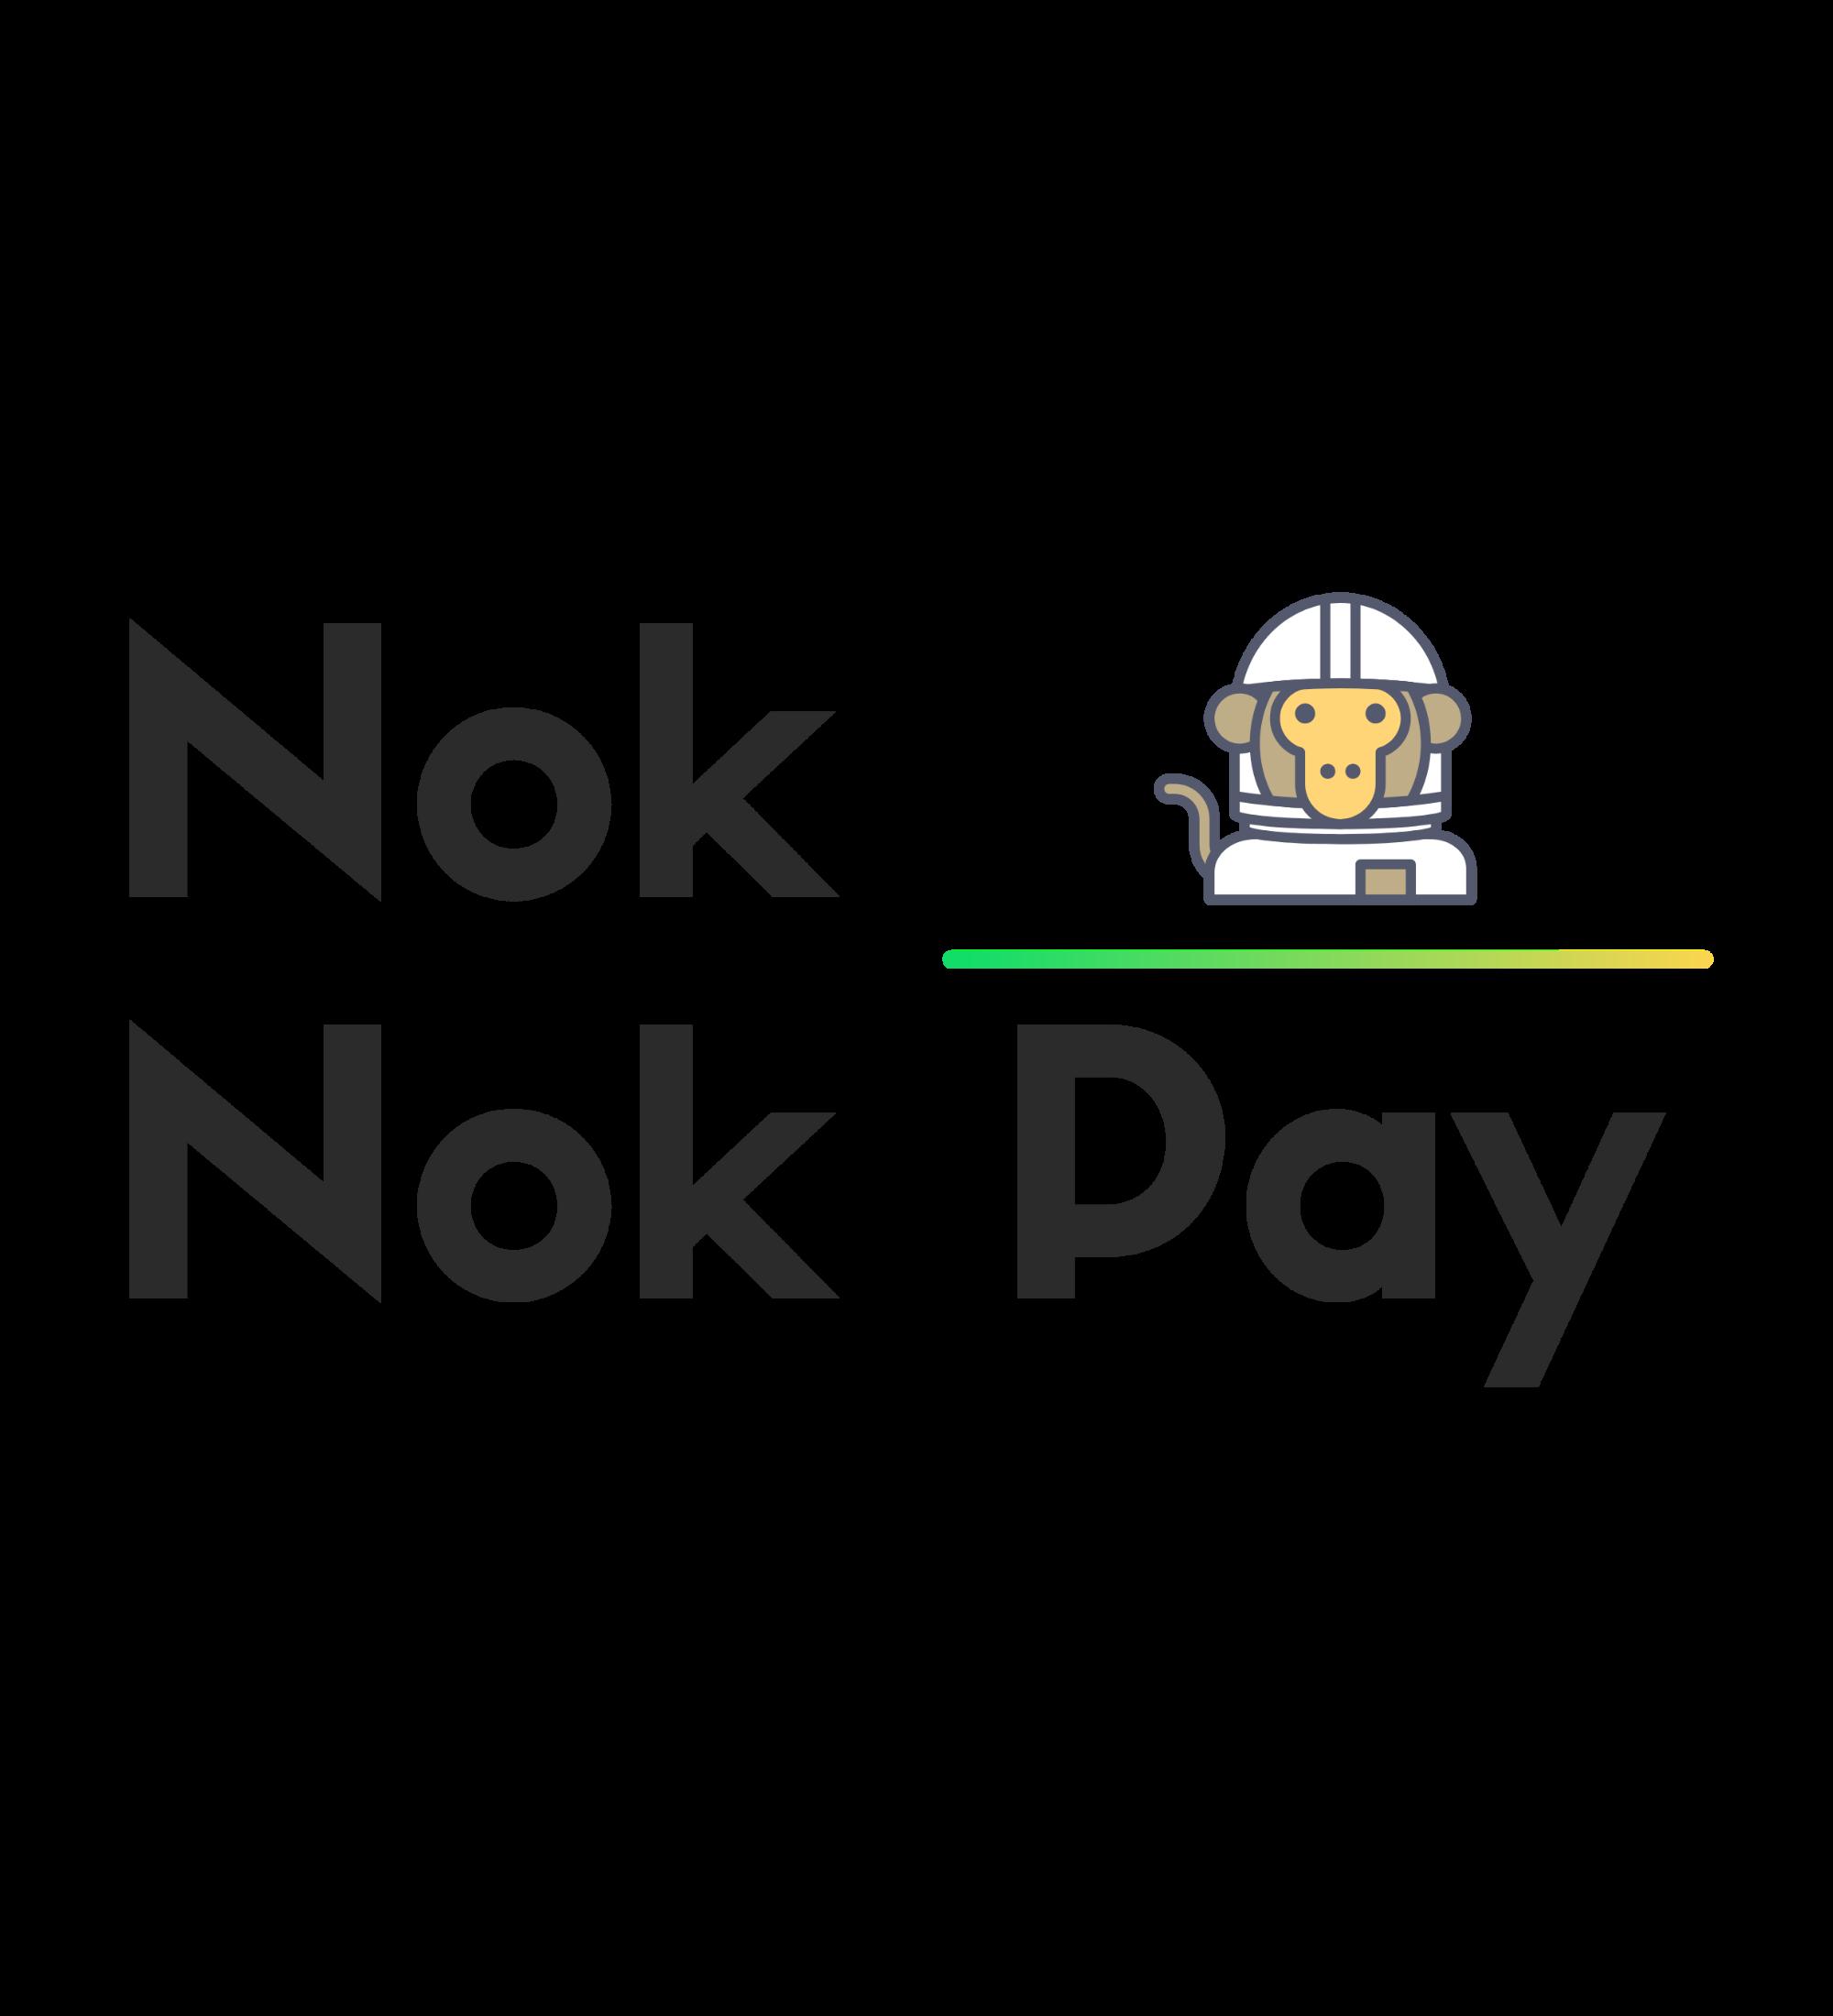 noknokpay